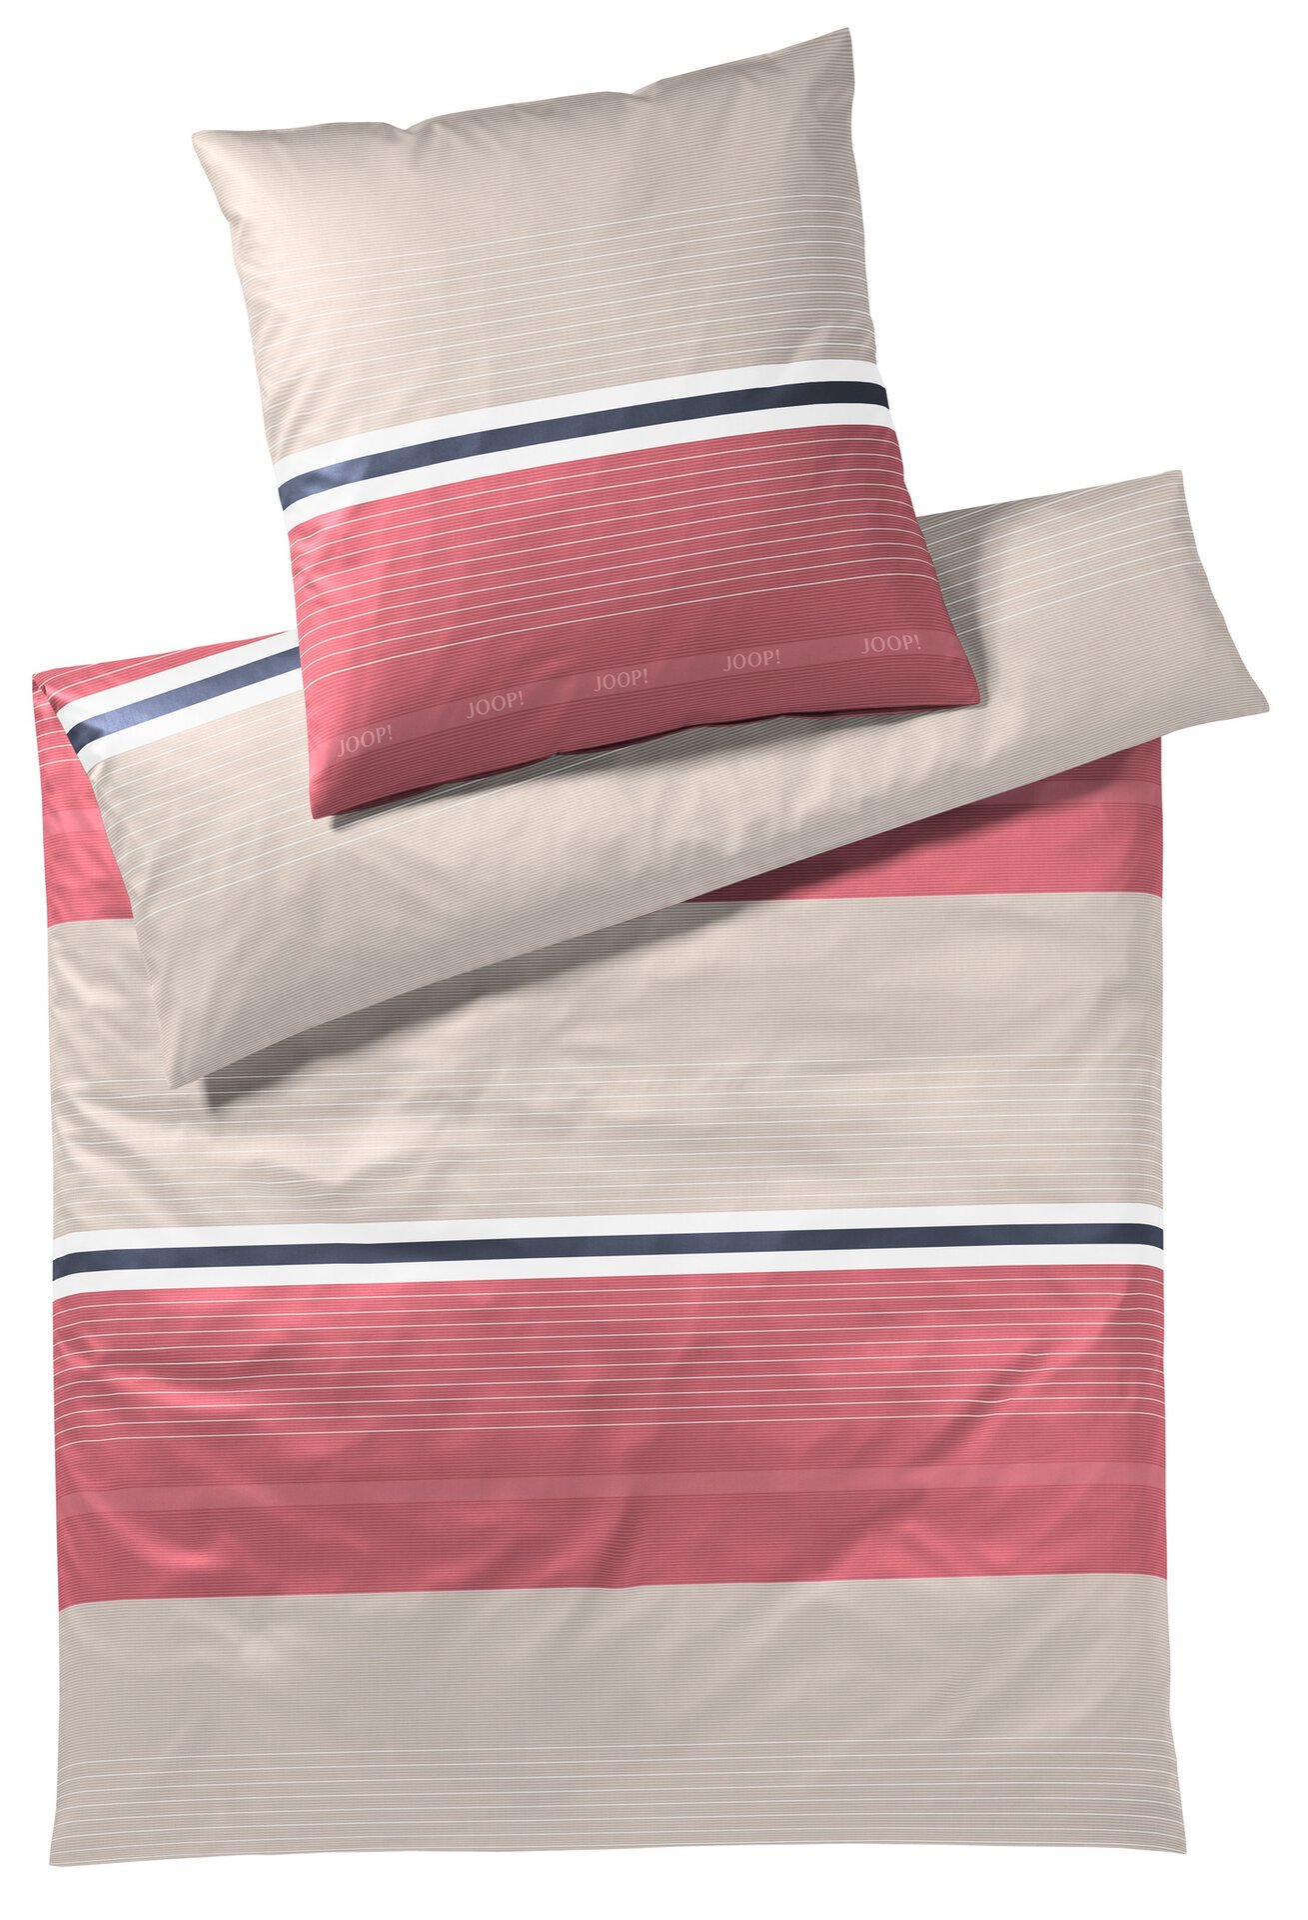 Satin-Bettwäsche Fit Joop! Textil rot 135 x 200 cm